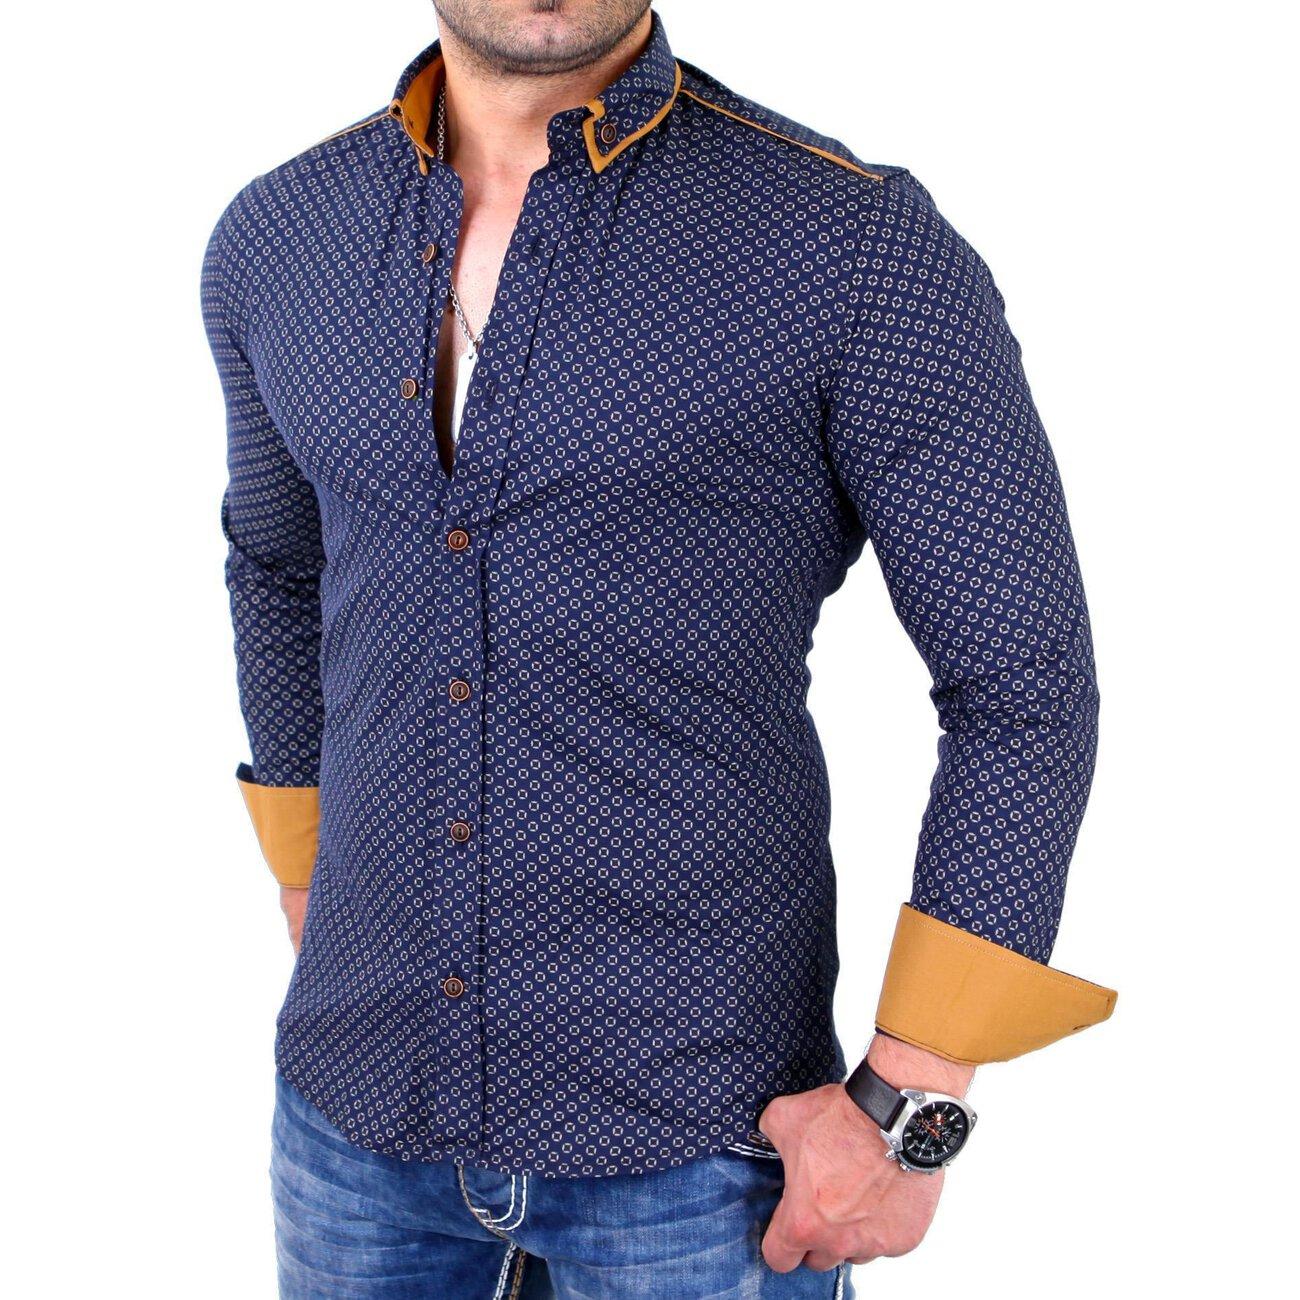 reslad hemd glencheck button down kragen g nstig kaufen. Black Bedroom Furniture Sets. Home Design Ideas